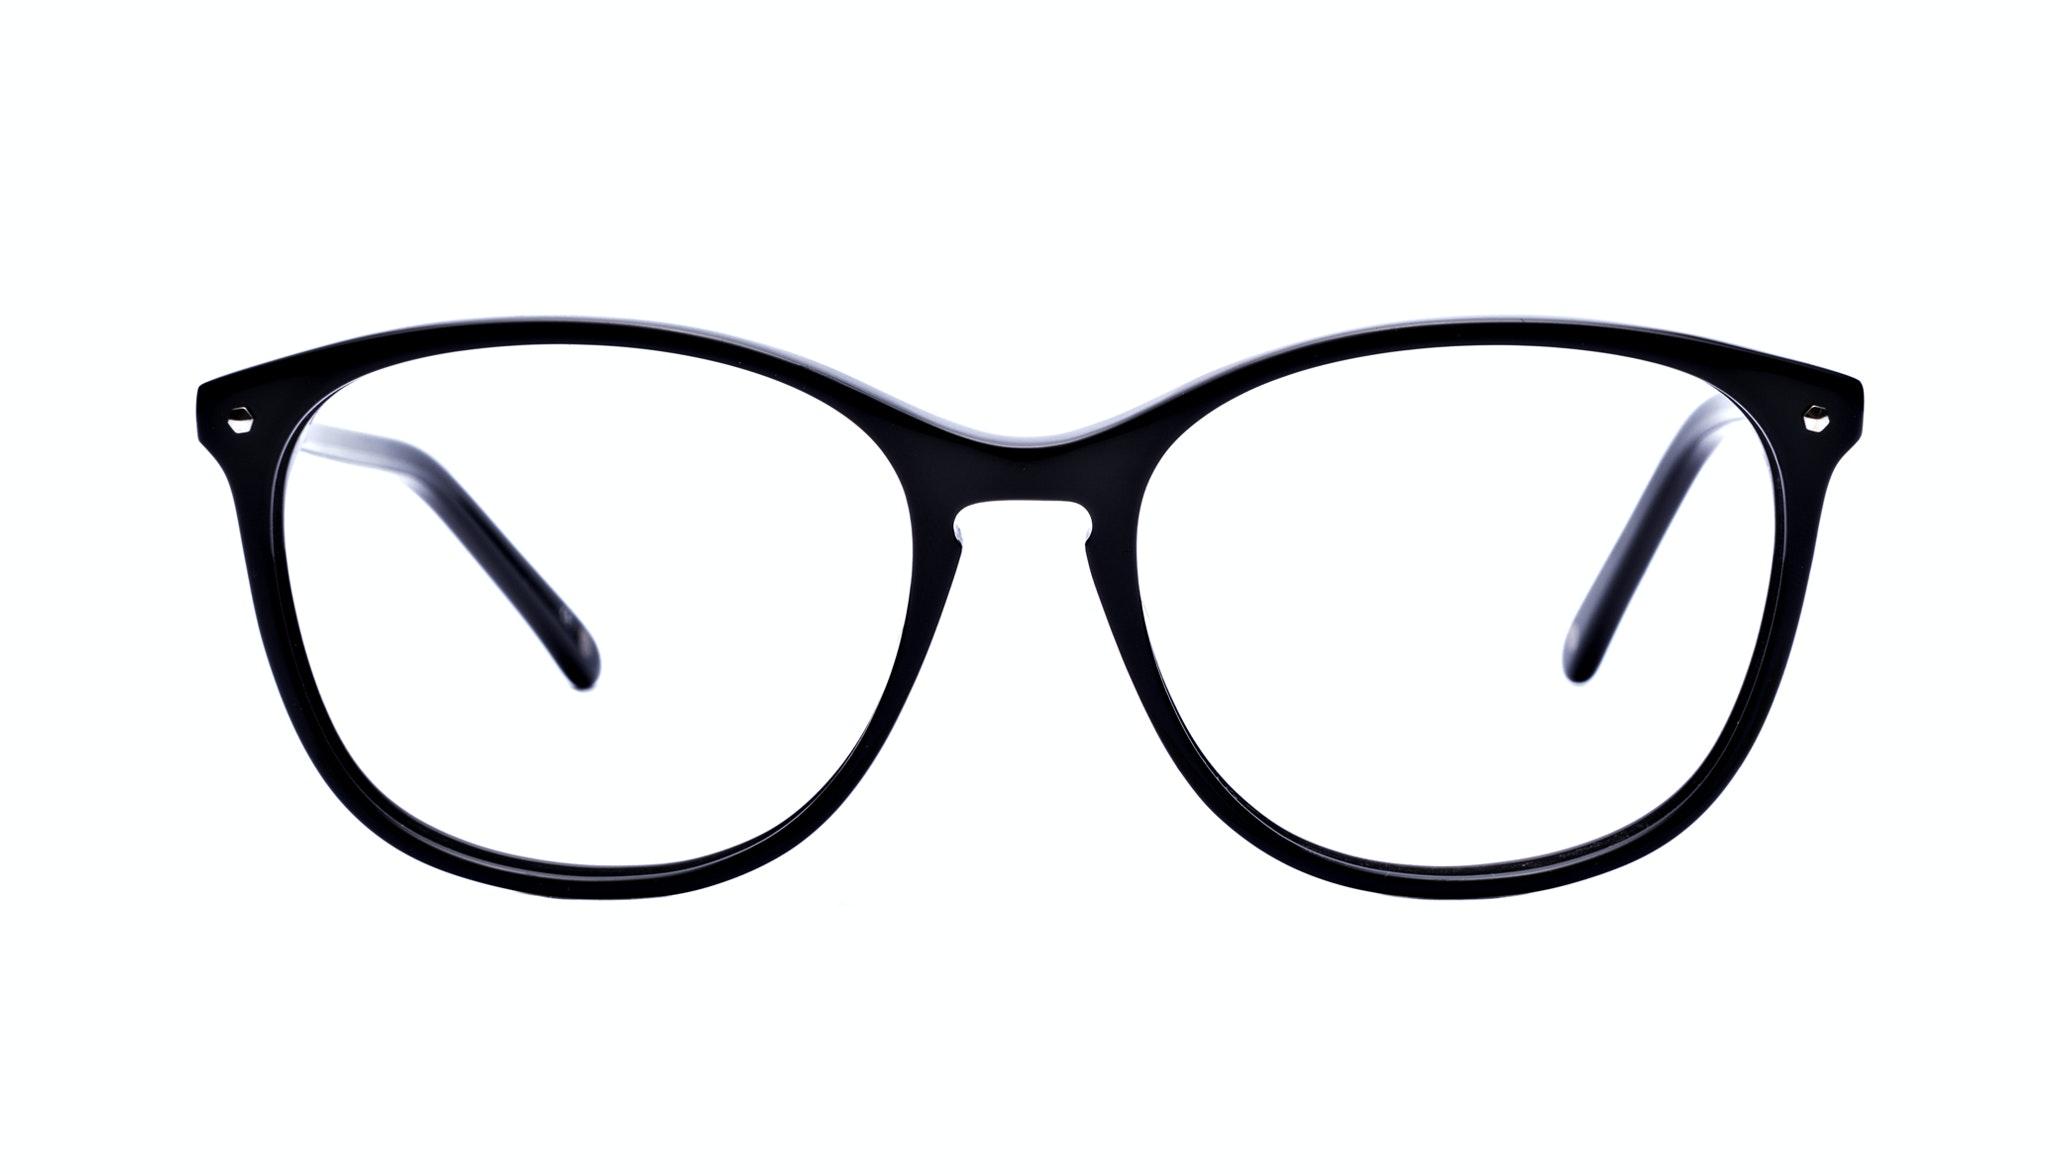 Affordable Fashion Glasses Rectangle Square Round Eyeglasses Women Nadine Pitch Black Front